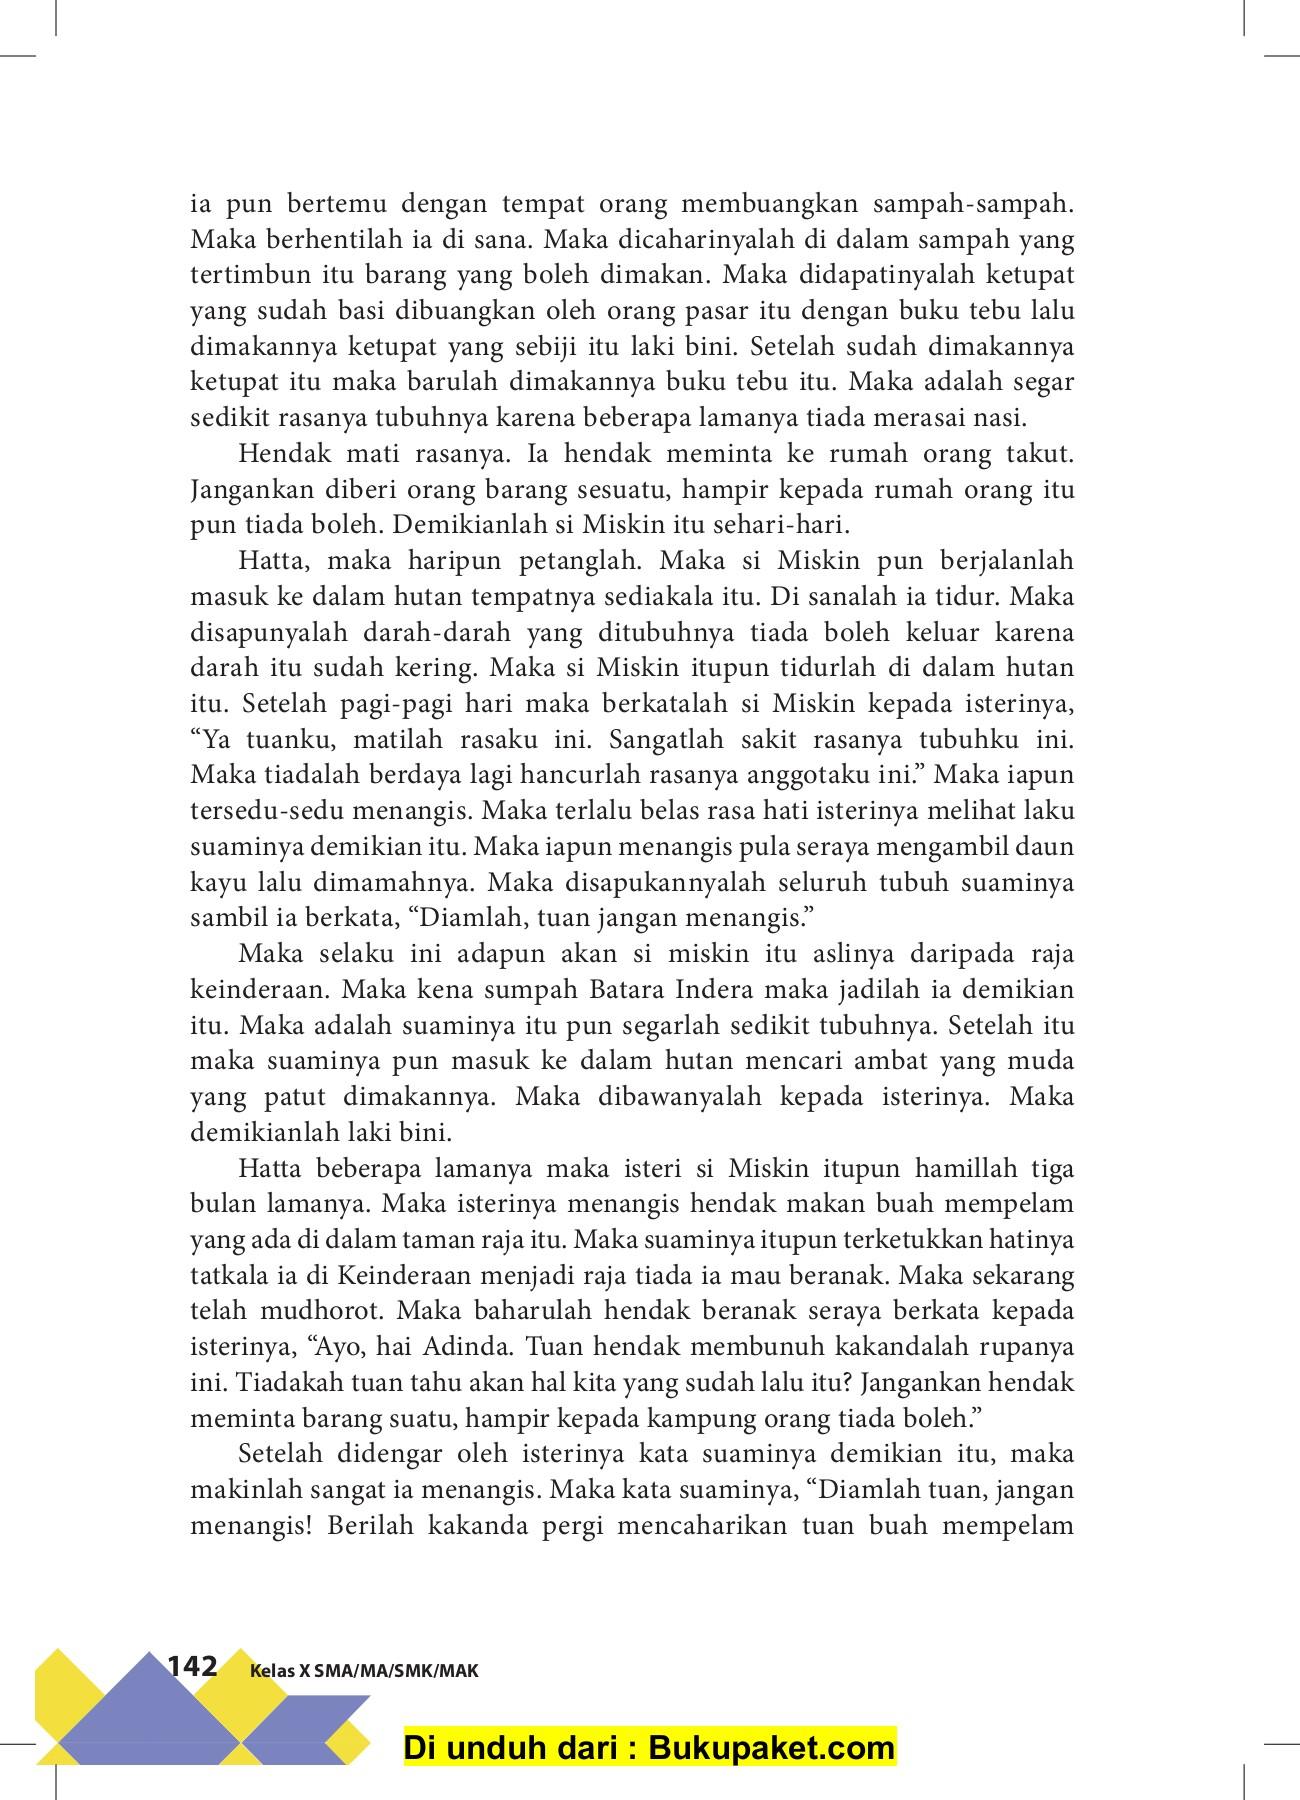 HIKAYAT | KAIDAH KEBAHASAAN | BAHASA INDONESIA - YouTube